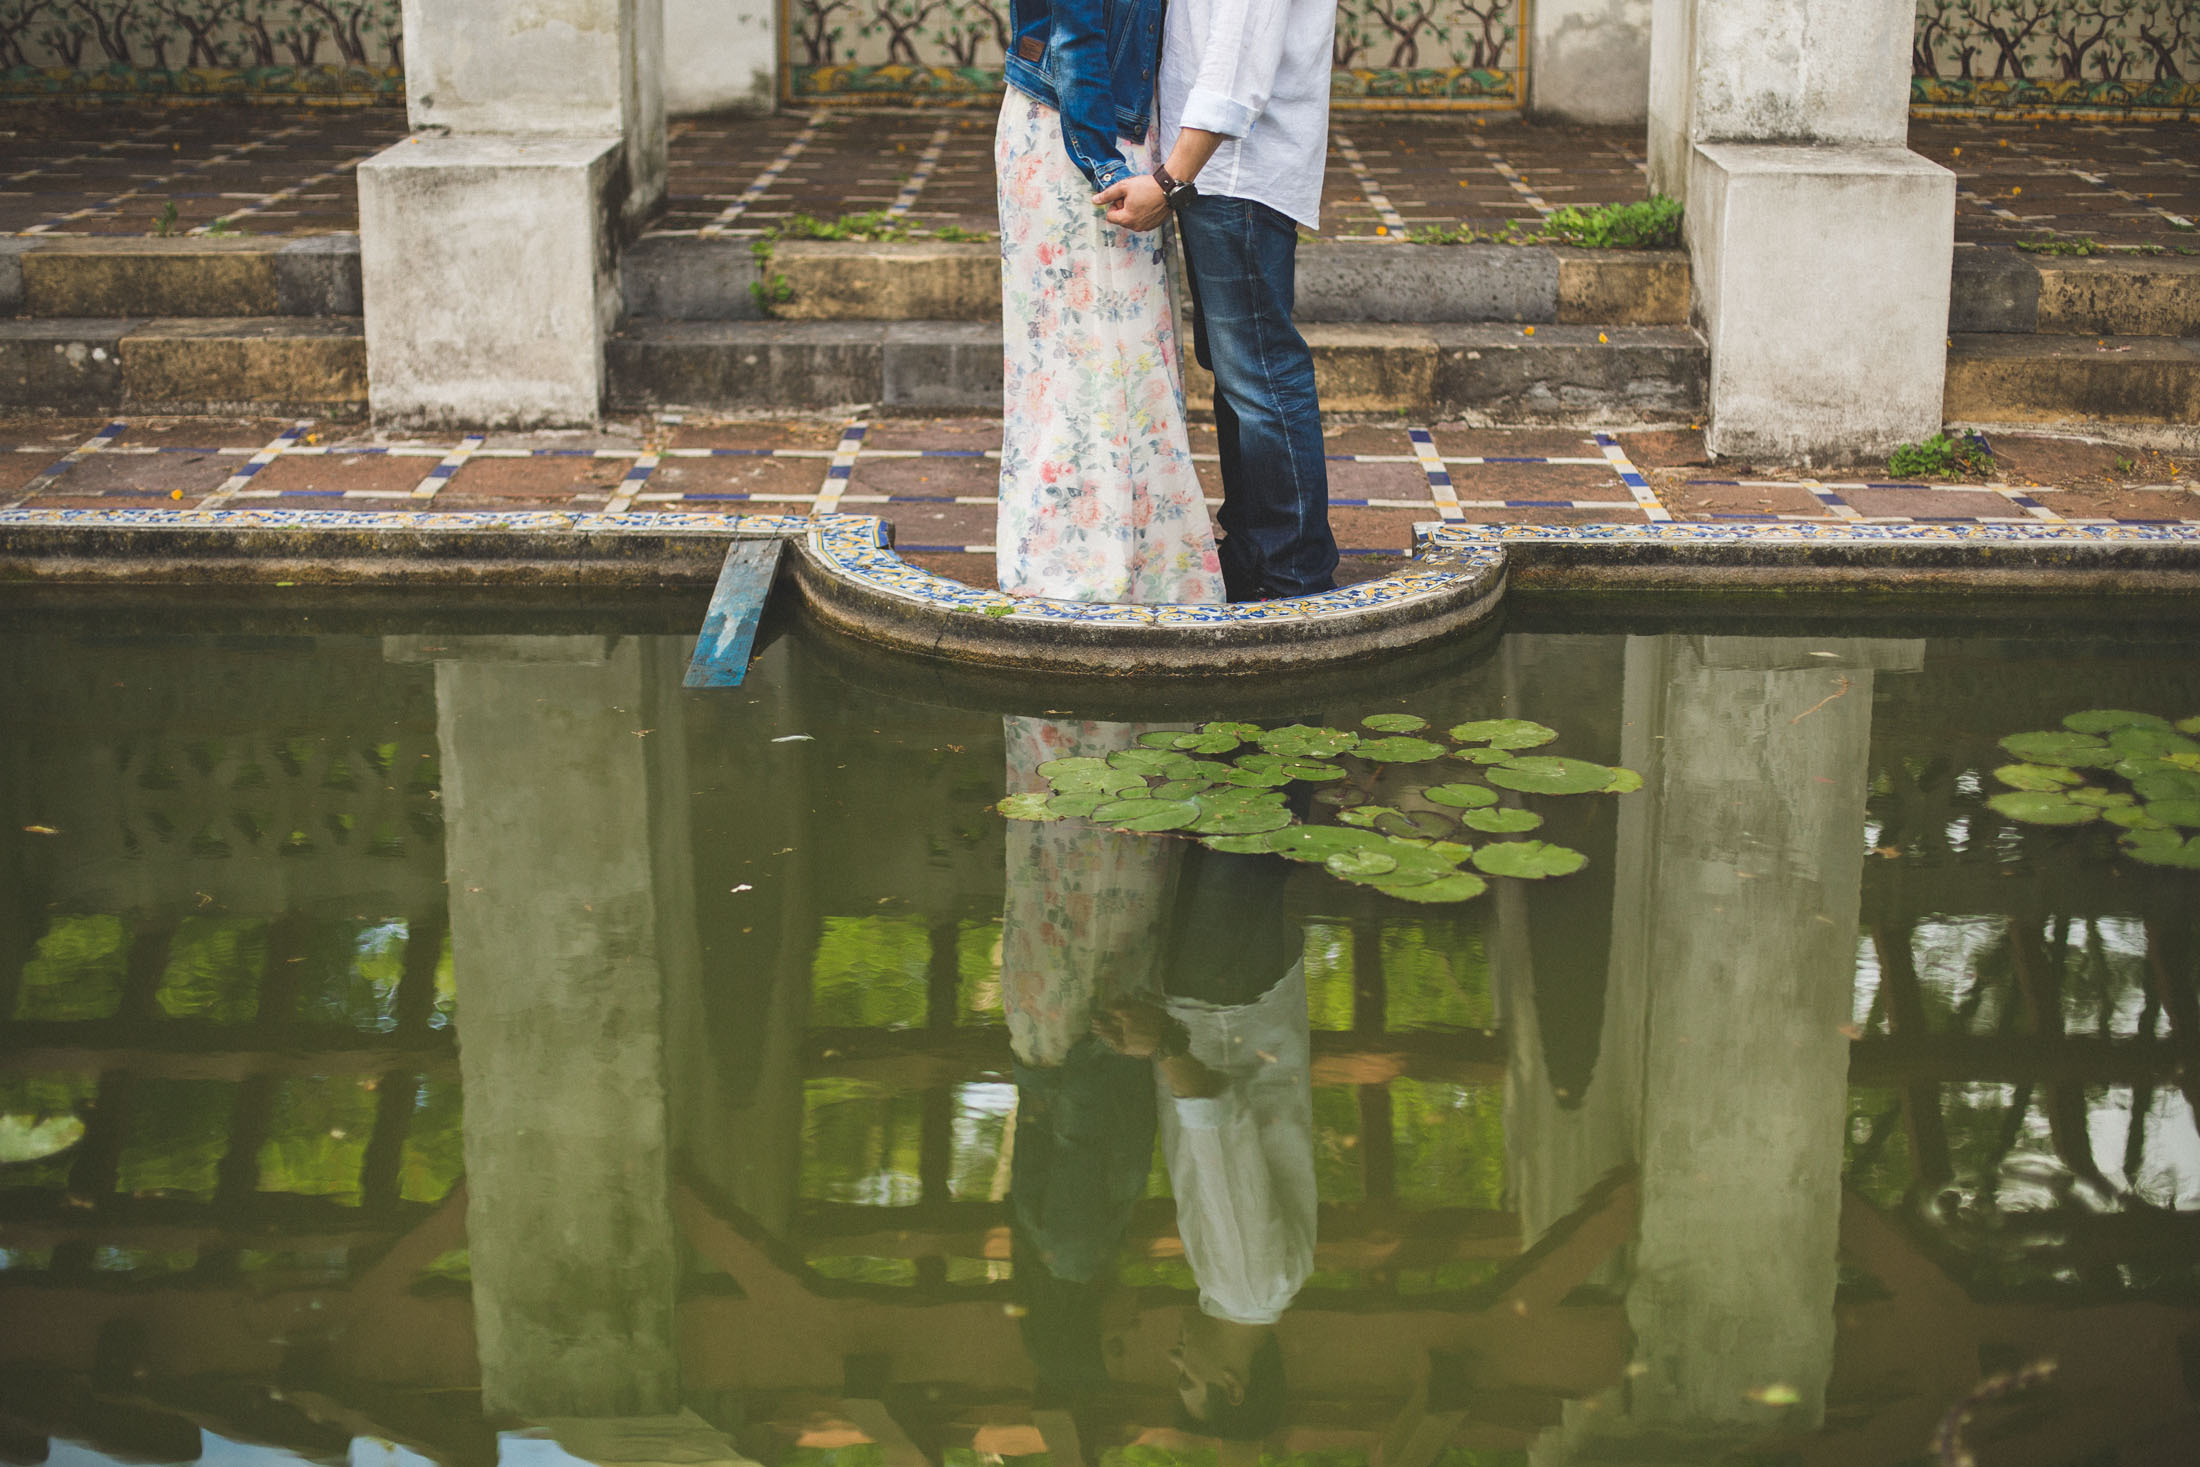 11 engagement-love-session-fundacao-Champalimaud-Filipe-Santiago-Fotografia-Lisboa-Mafra-Malveira-Fotografo